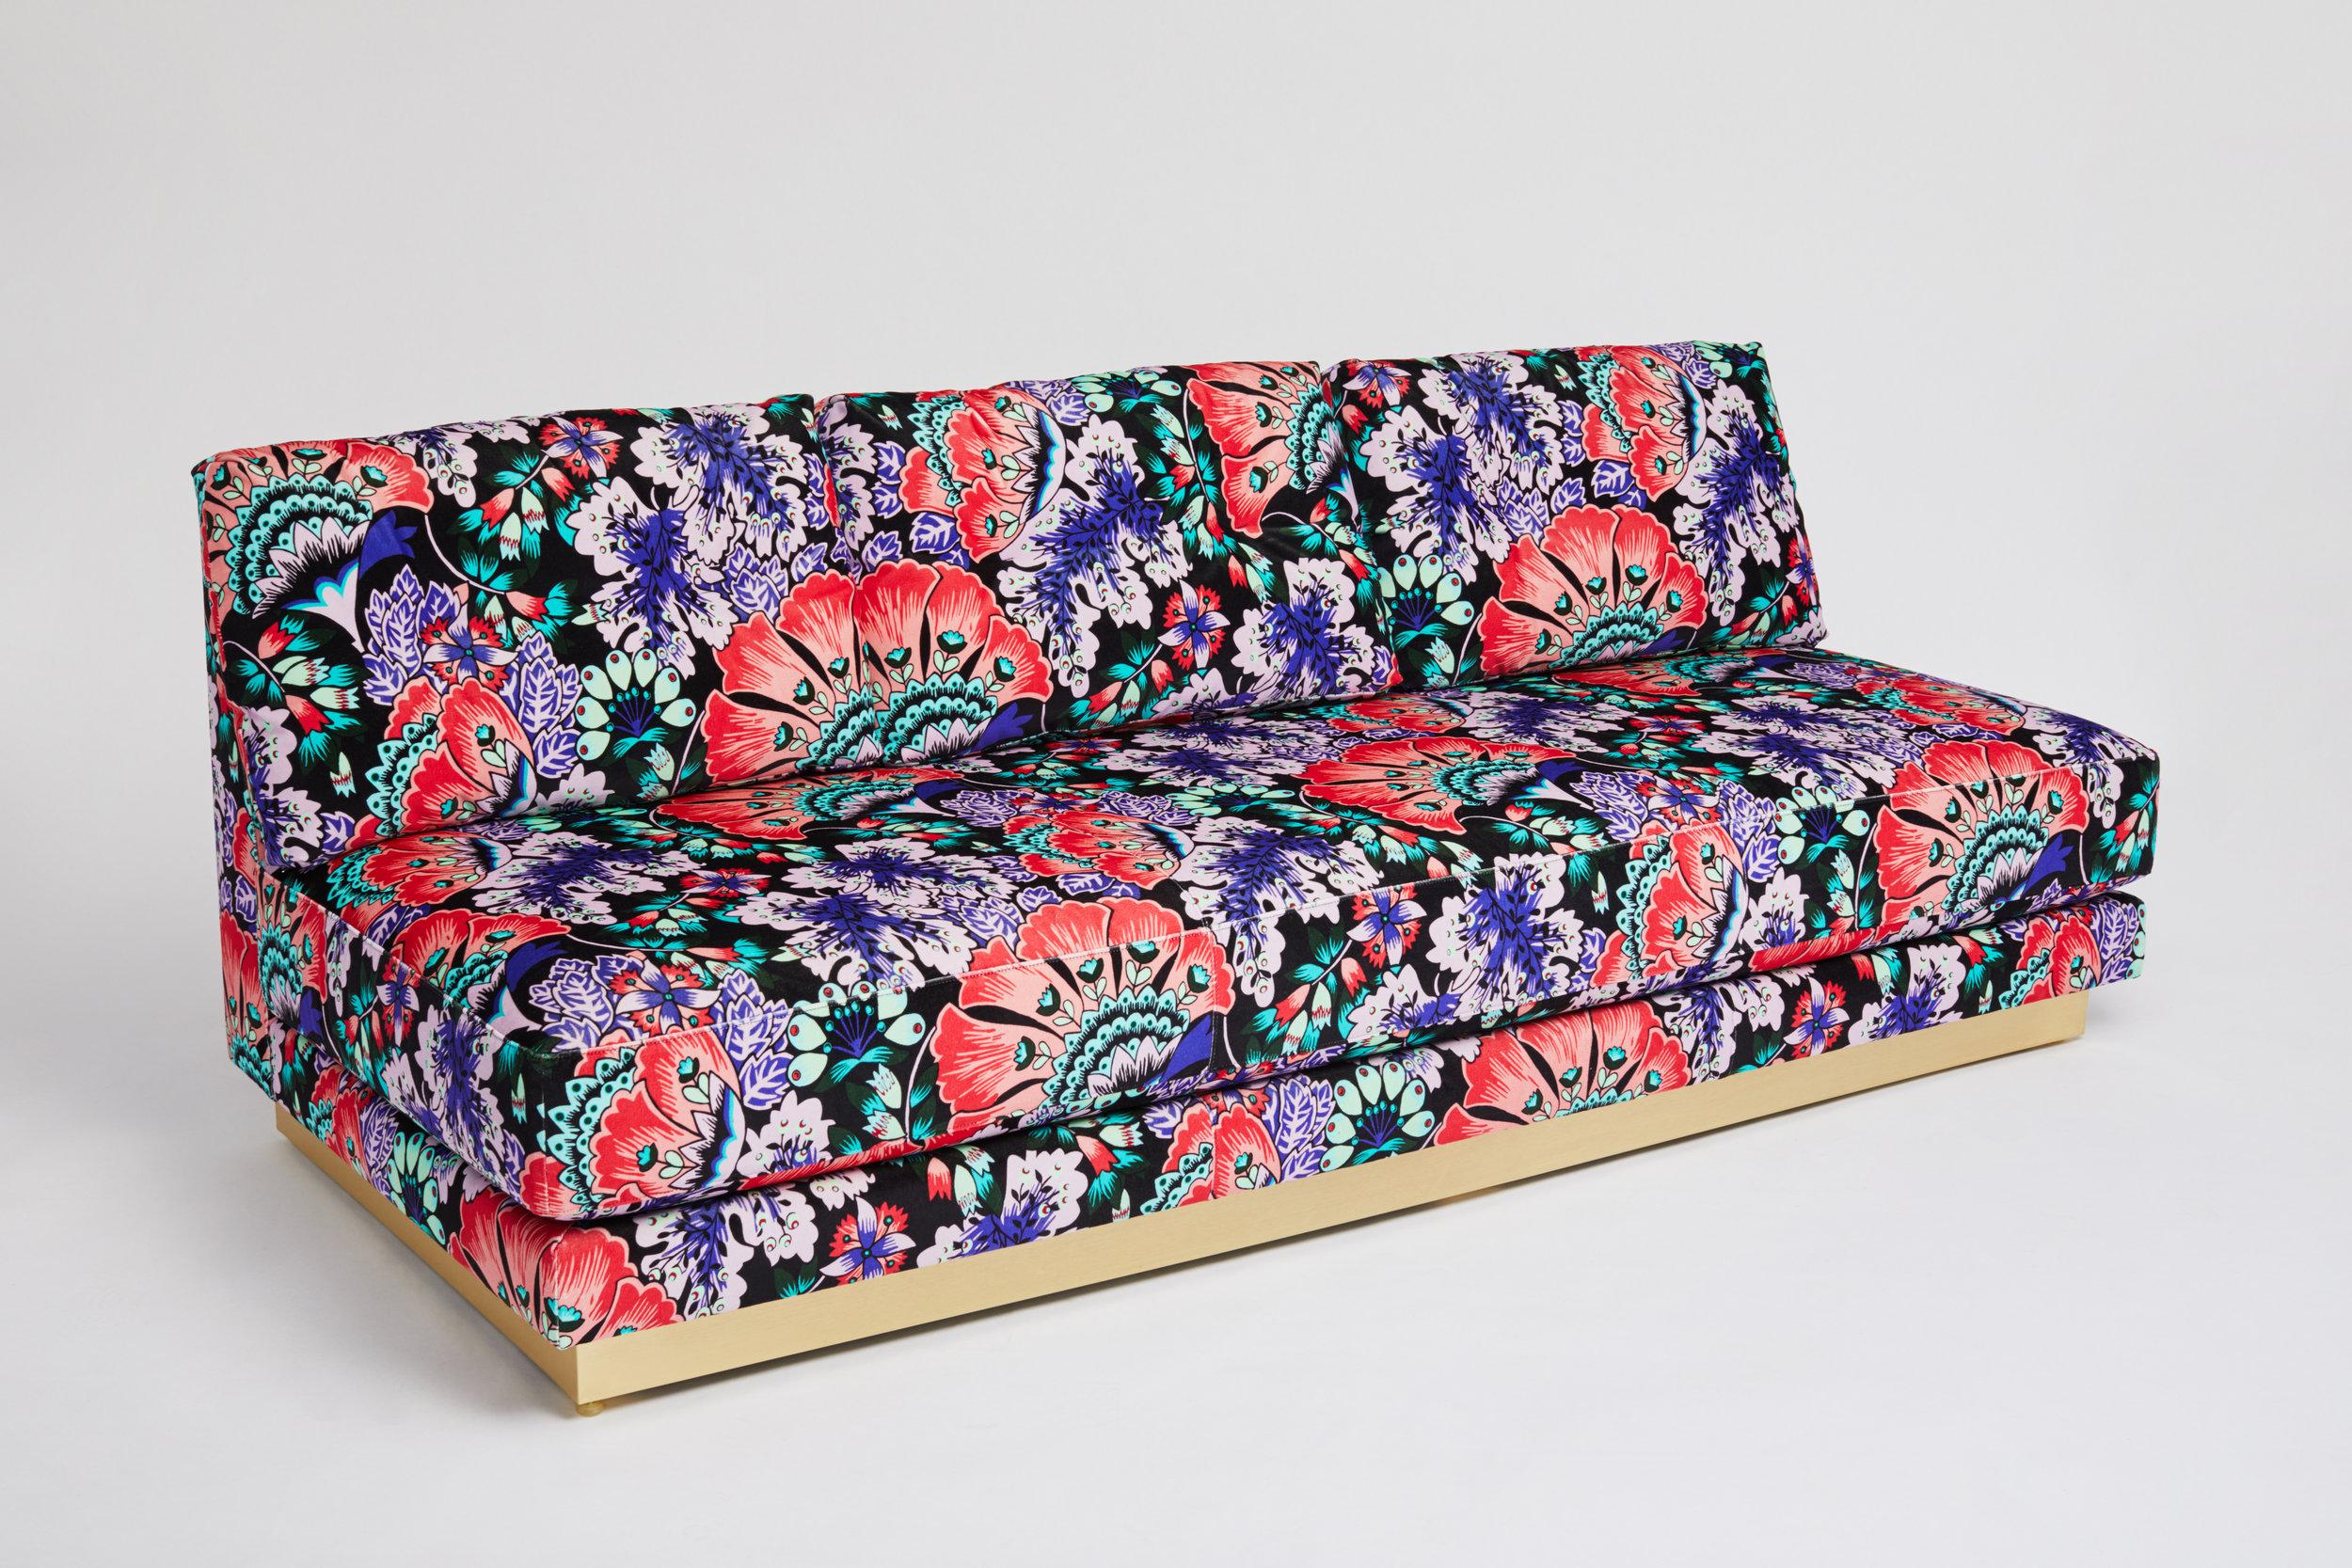 Liberty Cardiff Sofa in Feather Bloom.jpg